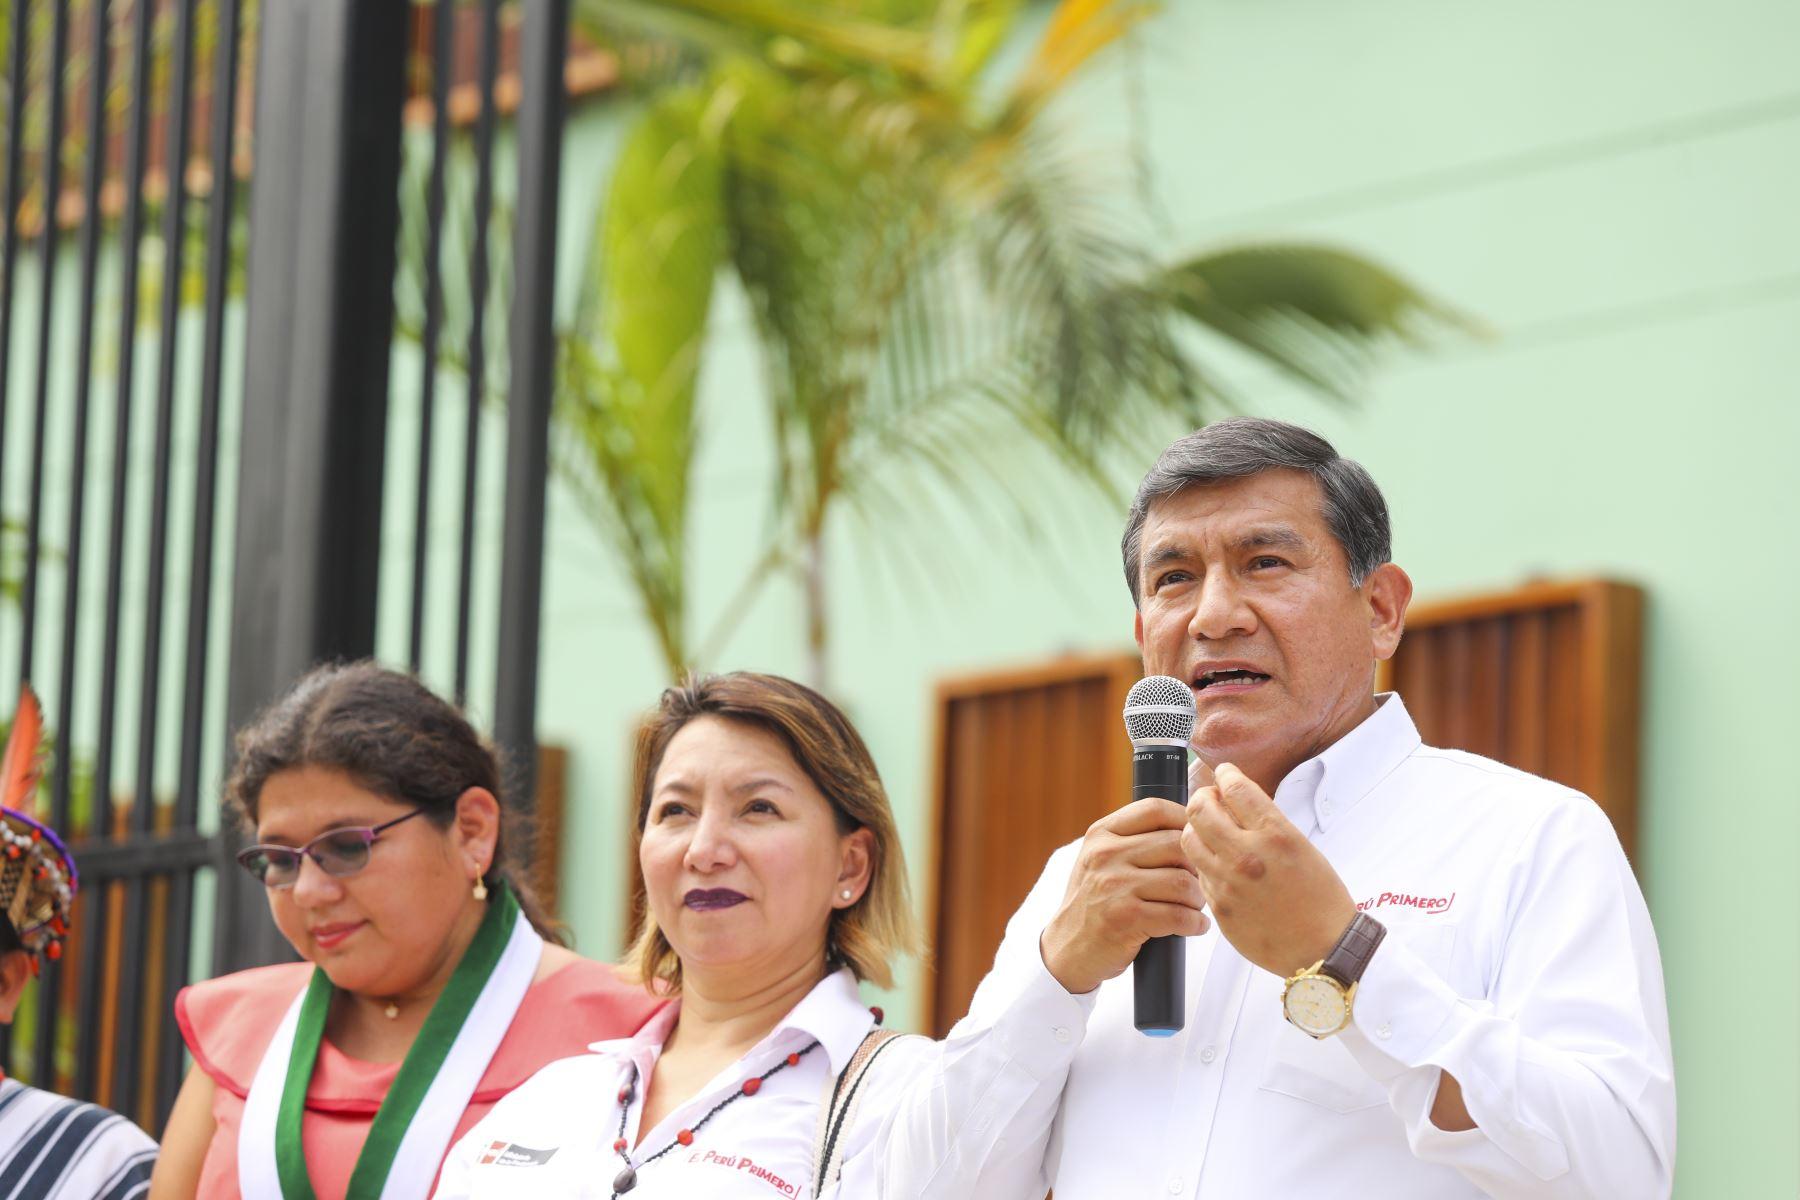 Presidente Vizcarra inaugura Complejo Policial de Río Negro. Foto: ANDINA/Prensa Presidencia